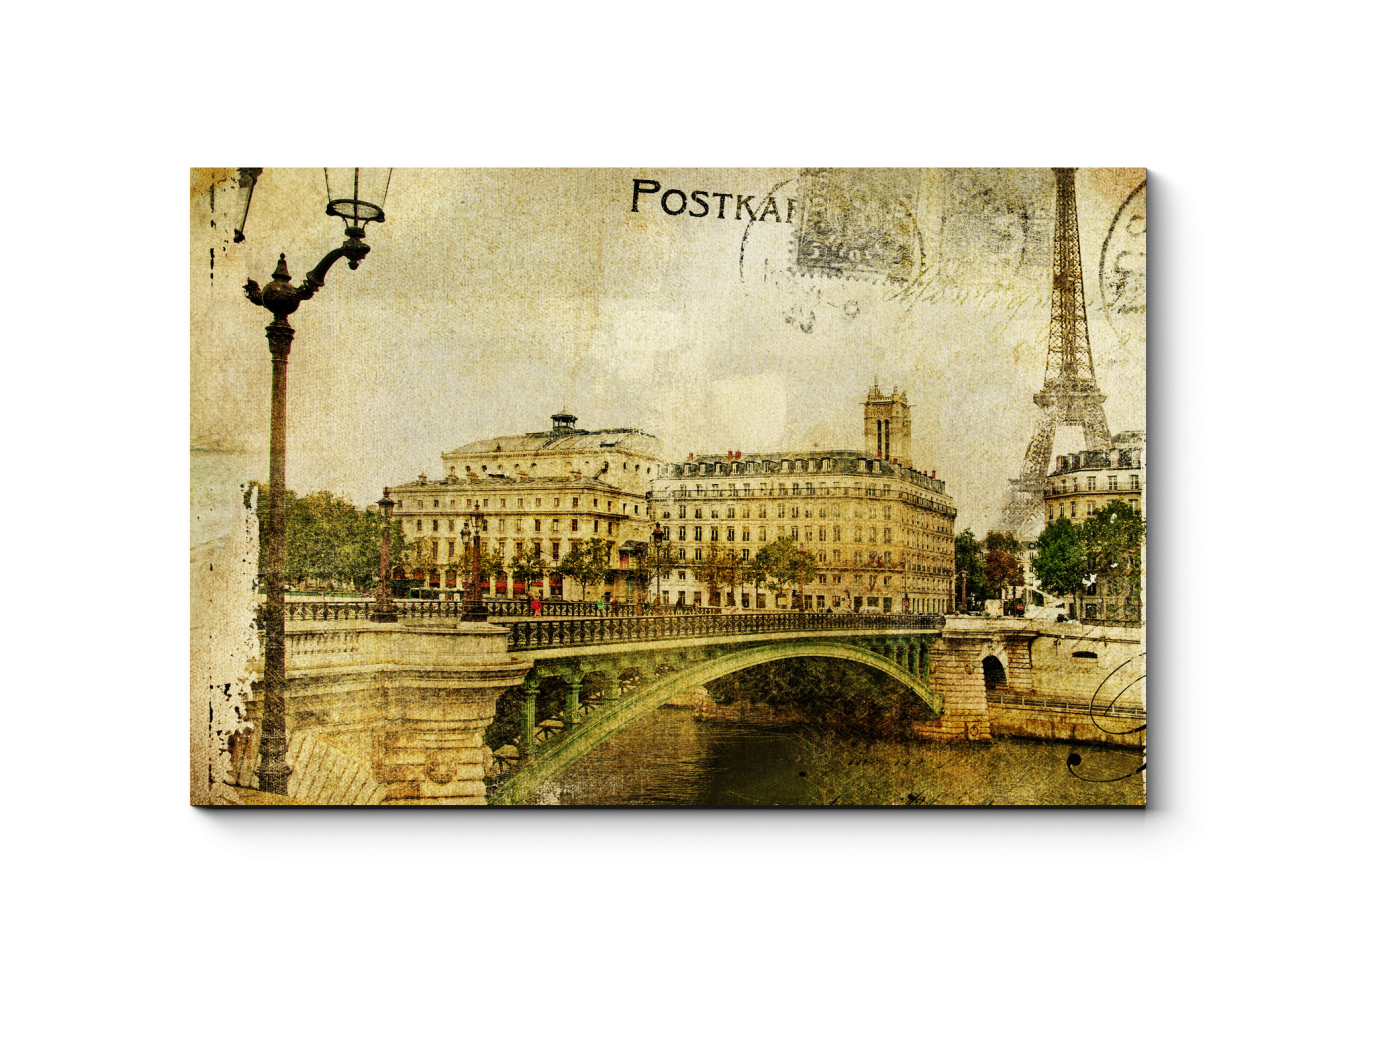 Привет из парижа открытка, днем